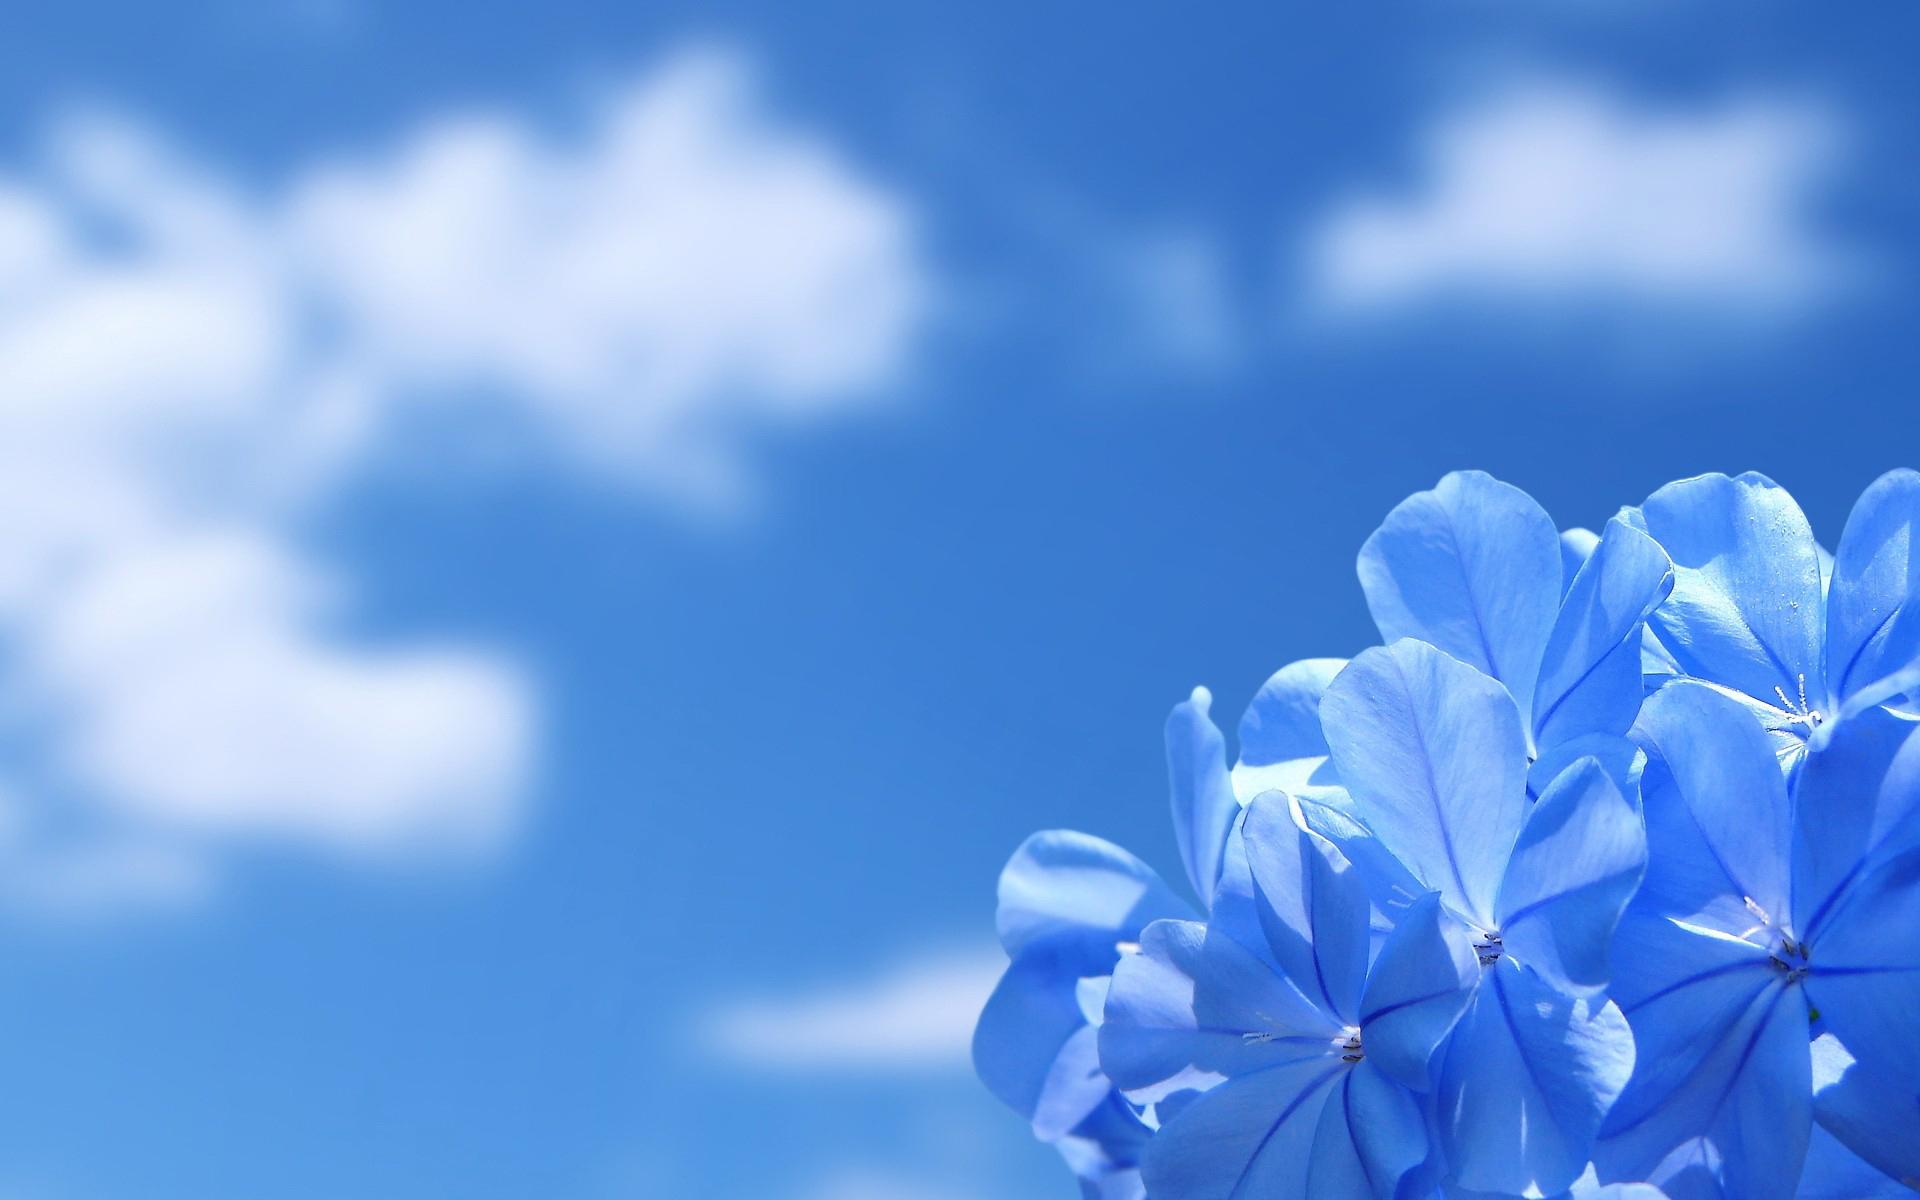 Blue Sky Wallpaper Hd: Blue Sky Wallpaper Background